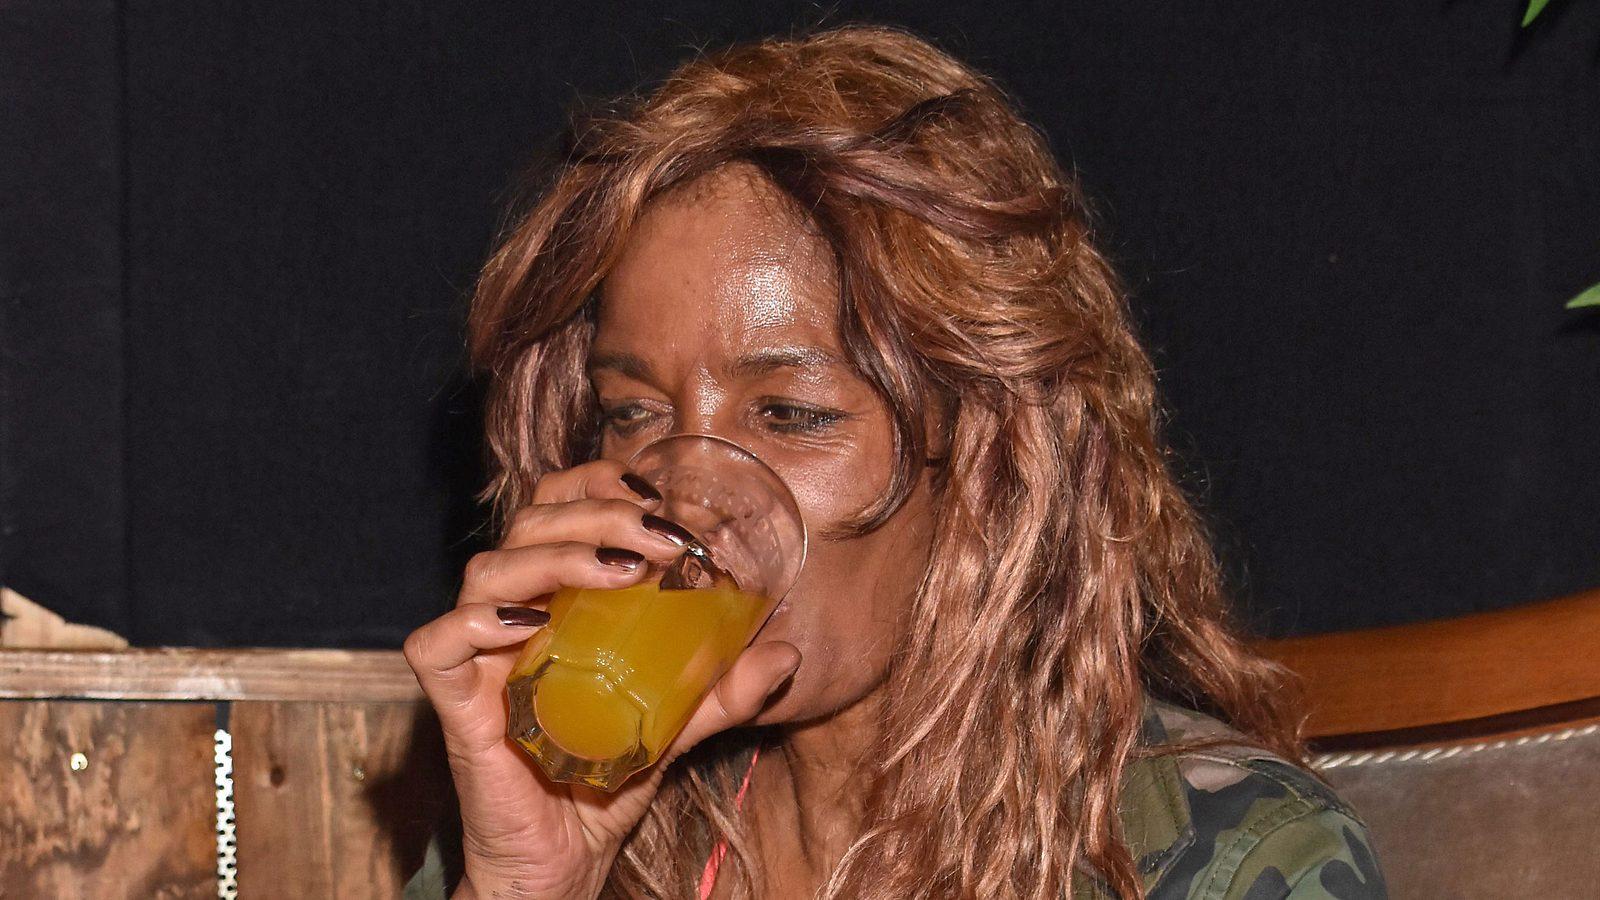 Naddel abdel farrag alkohol. Nadja Abd el Farrag - IMDb